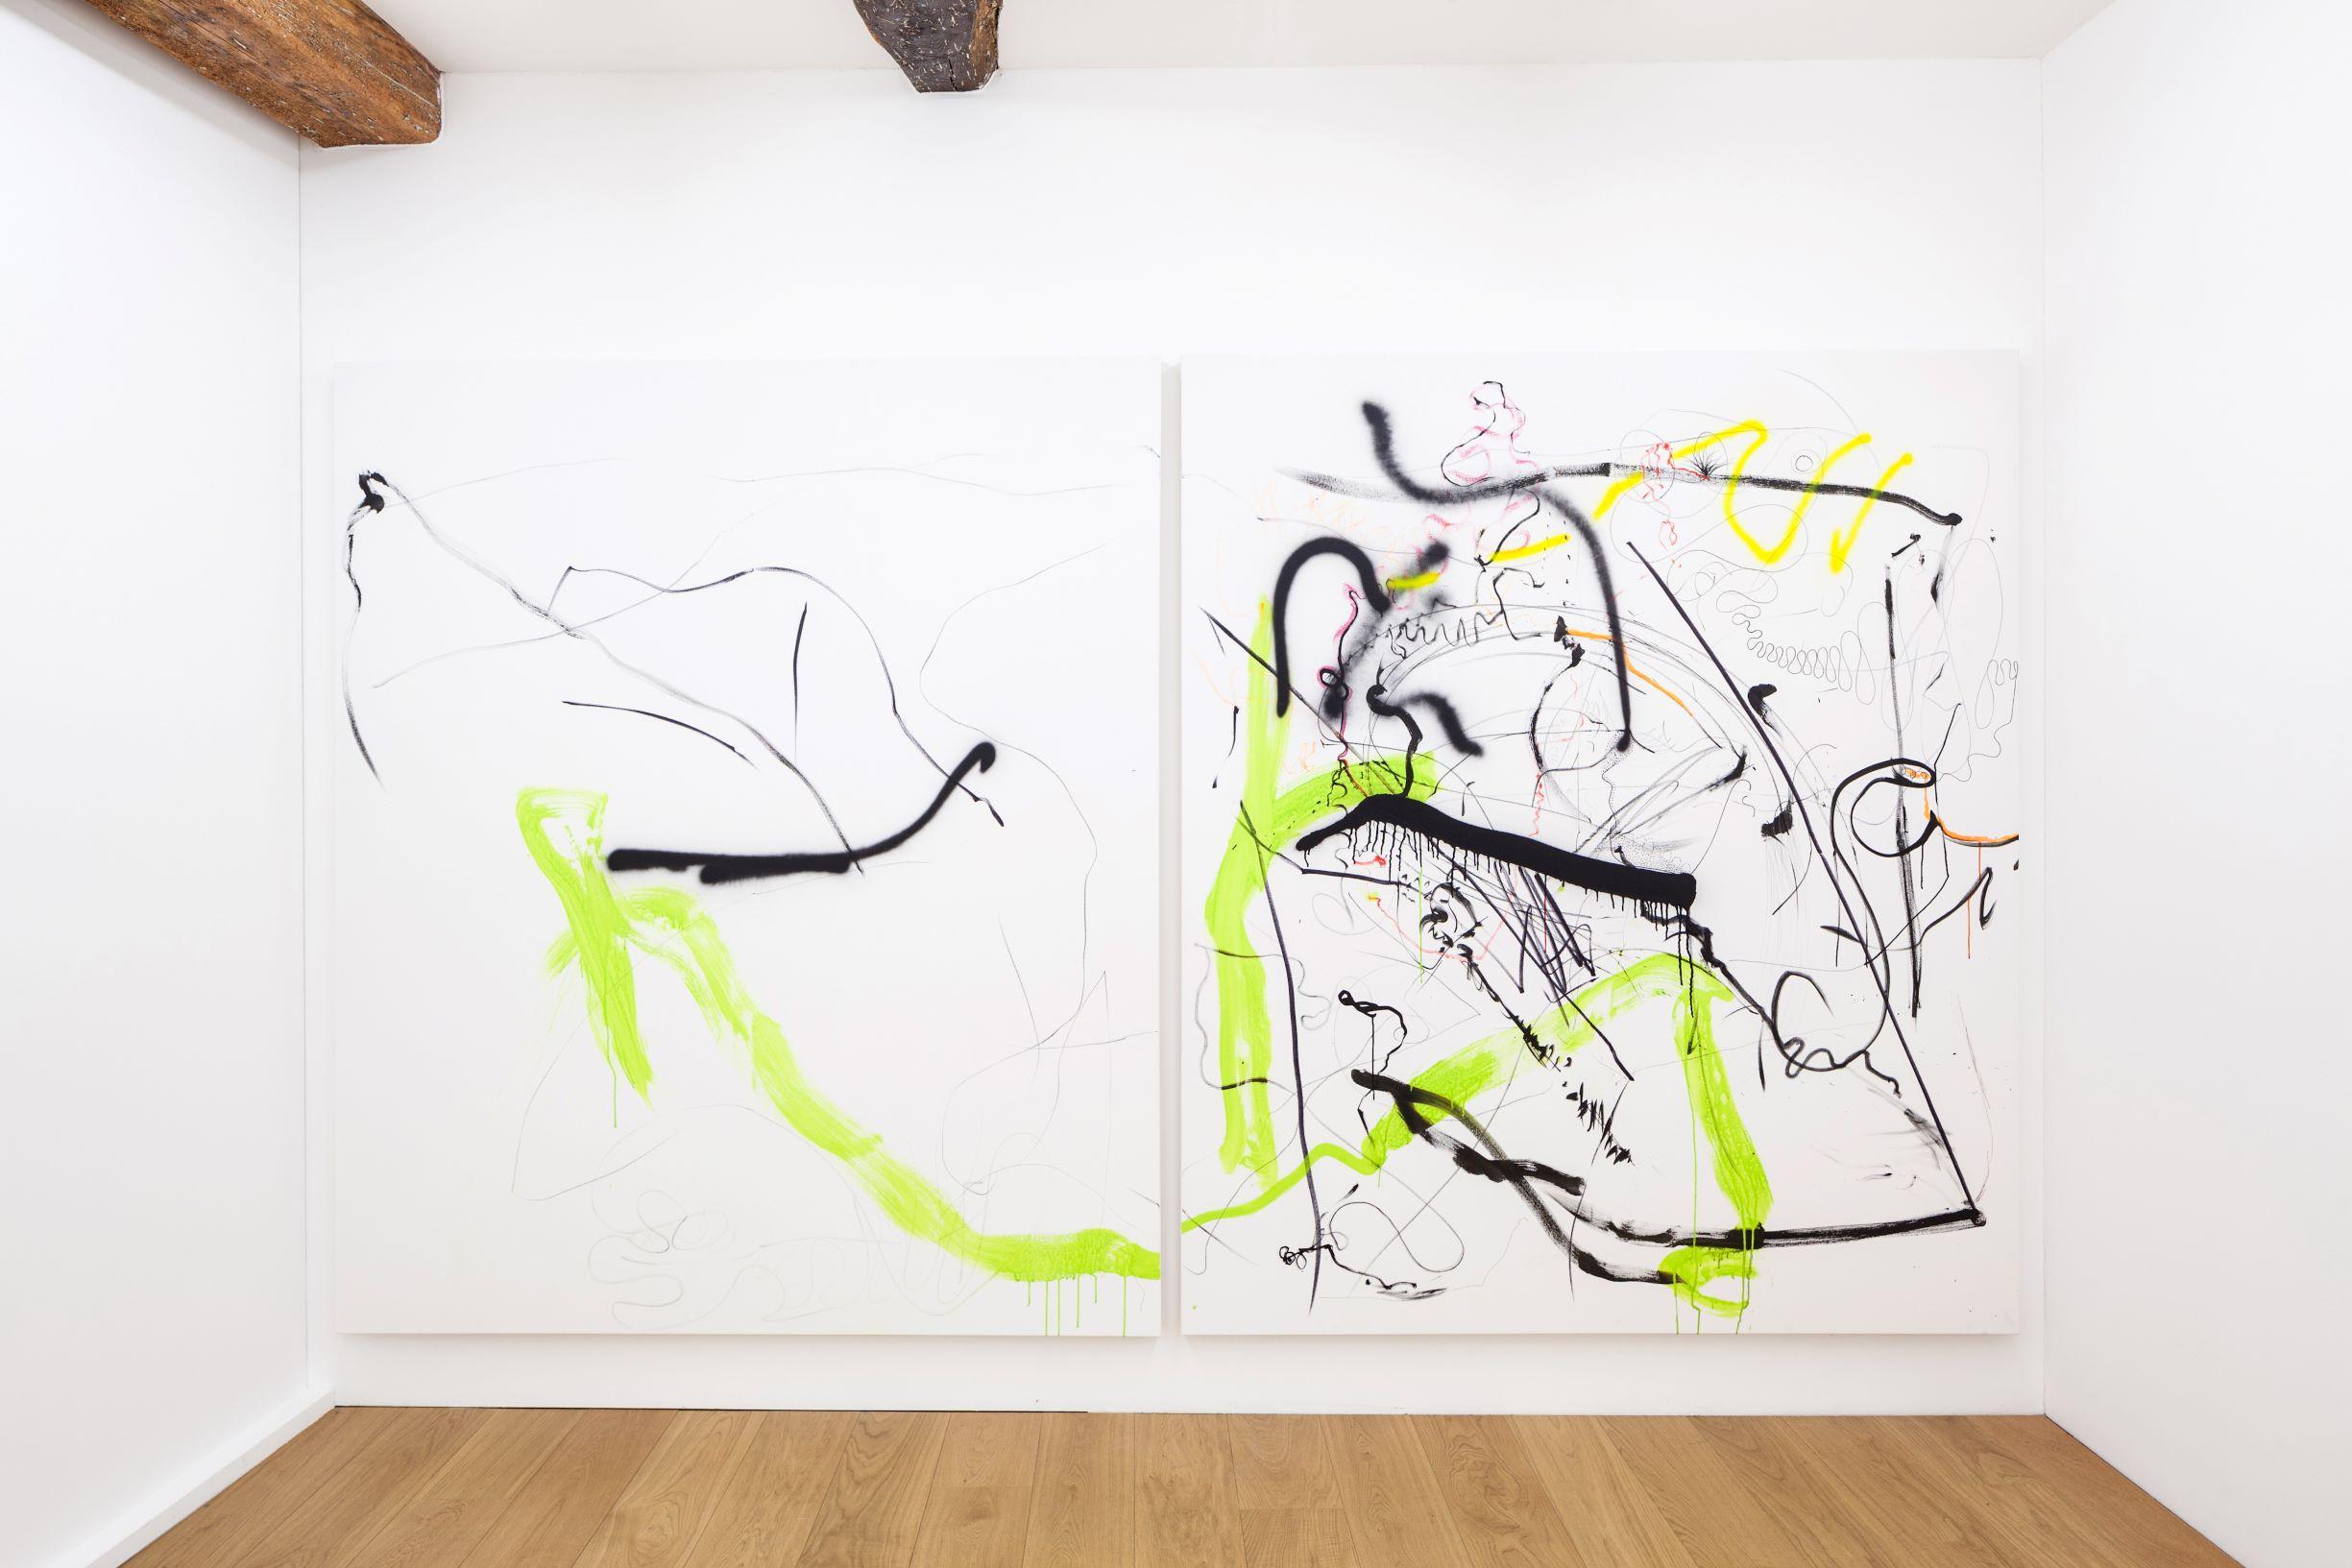 SCRIPTS, Linda Semadeni, Kirchgasse ©Björn Allemann, Not titled yet, 2020, Diptych, Gouache, ink, marker on canvas, 2 x (200 x 170cm).